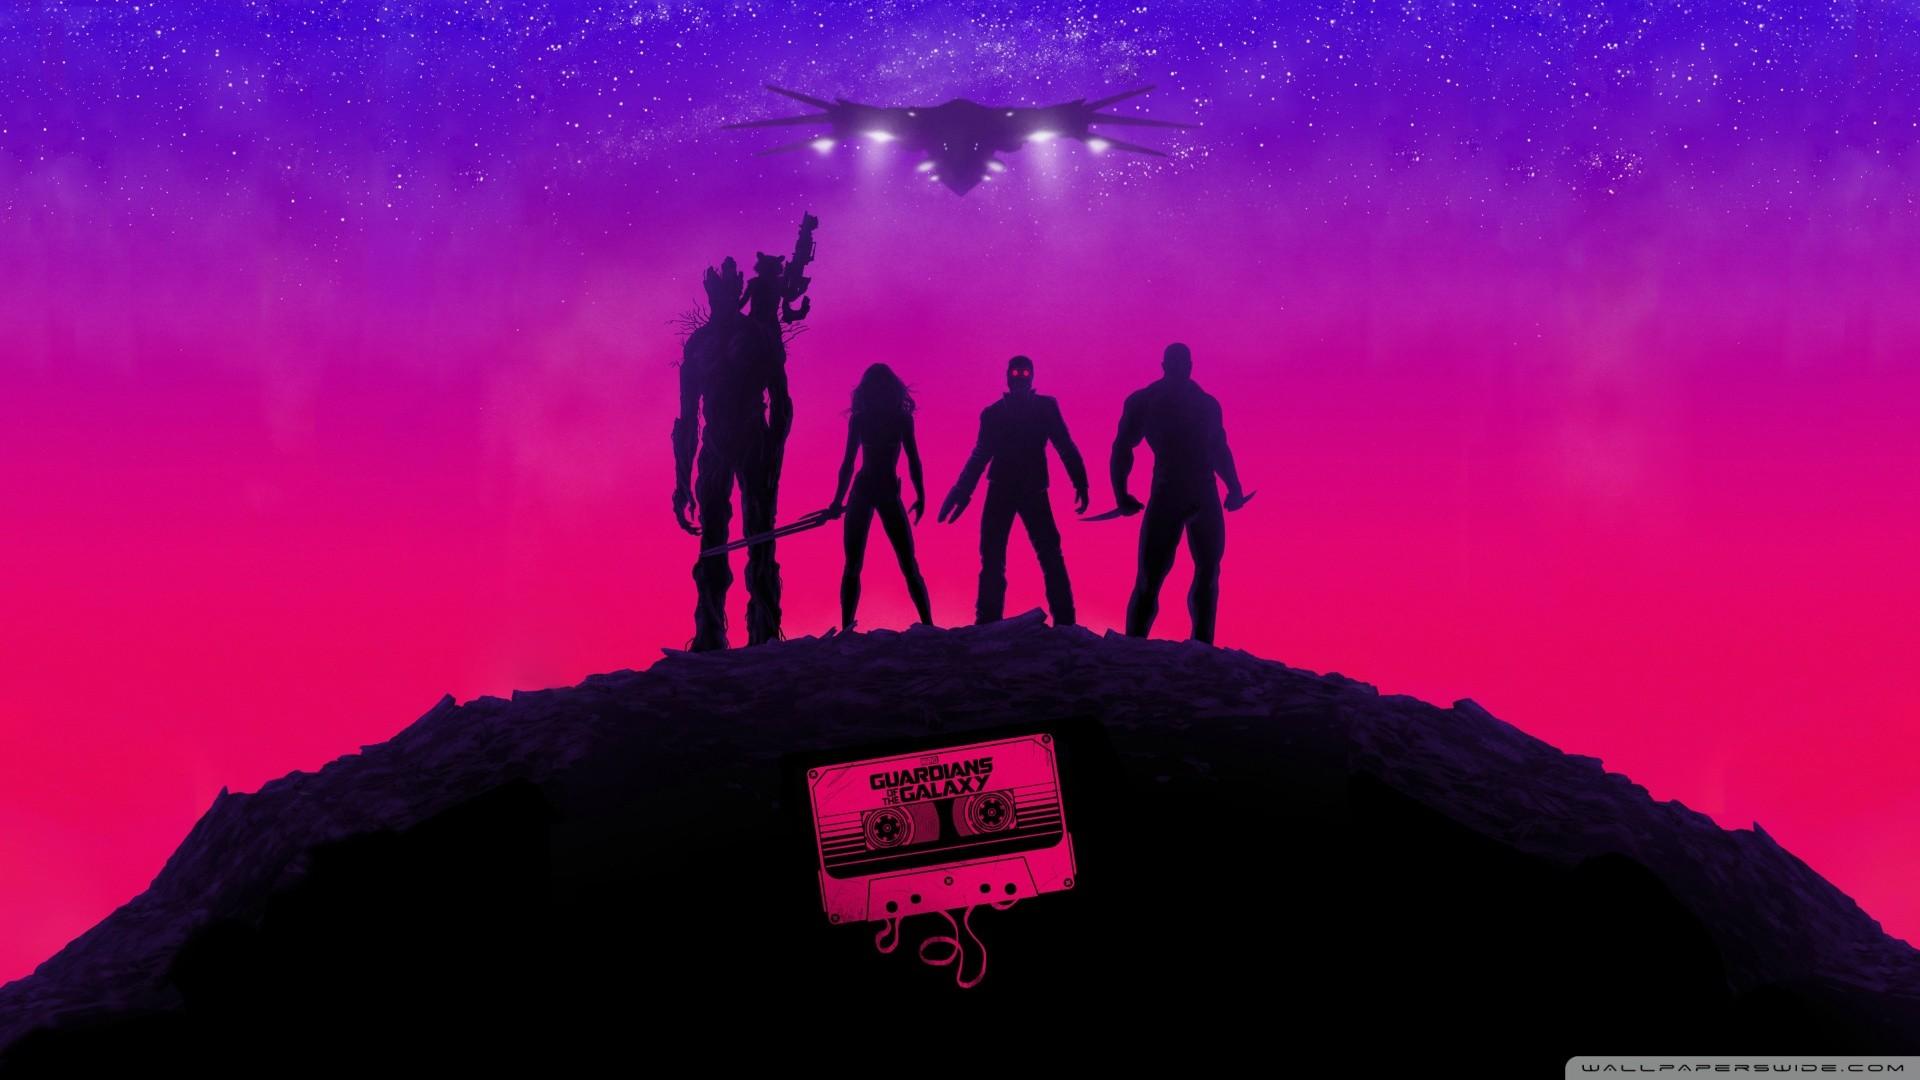 Guardians Of The Galaxy Official Poster wallpaper.   HD Wallpapers    Pinterest   Wallpaper